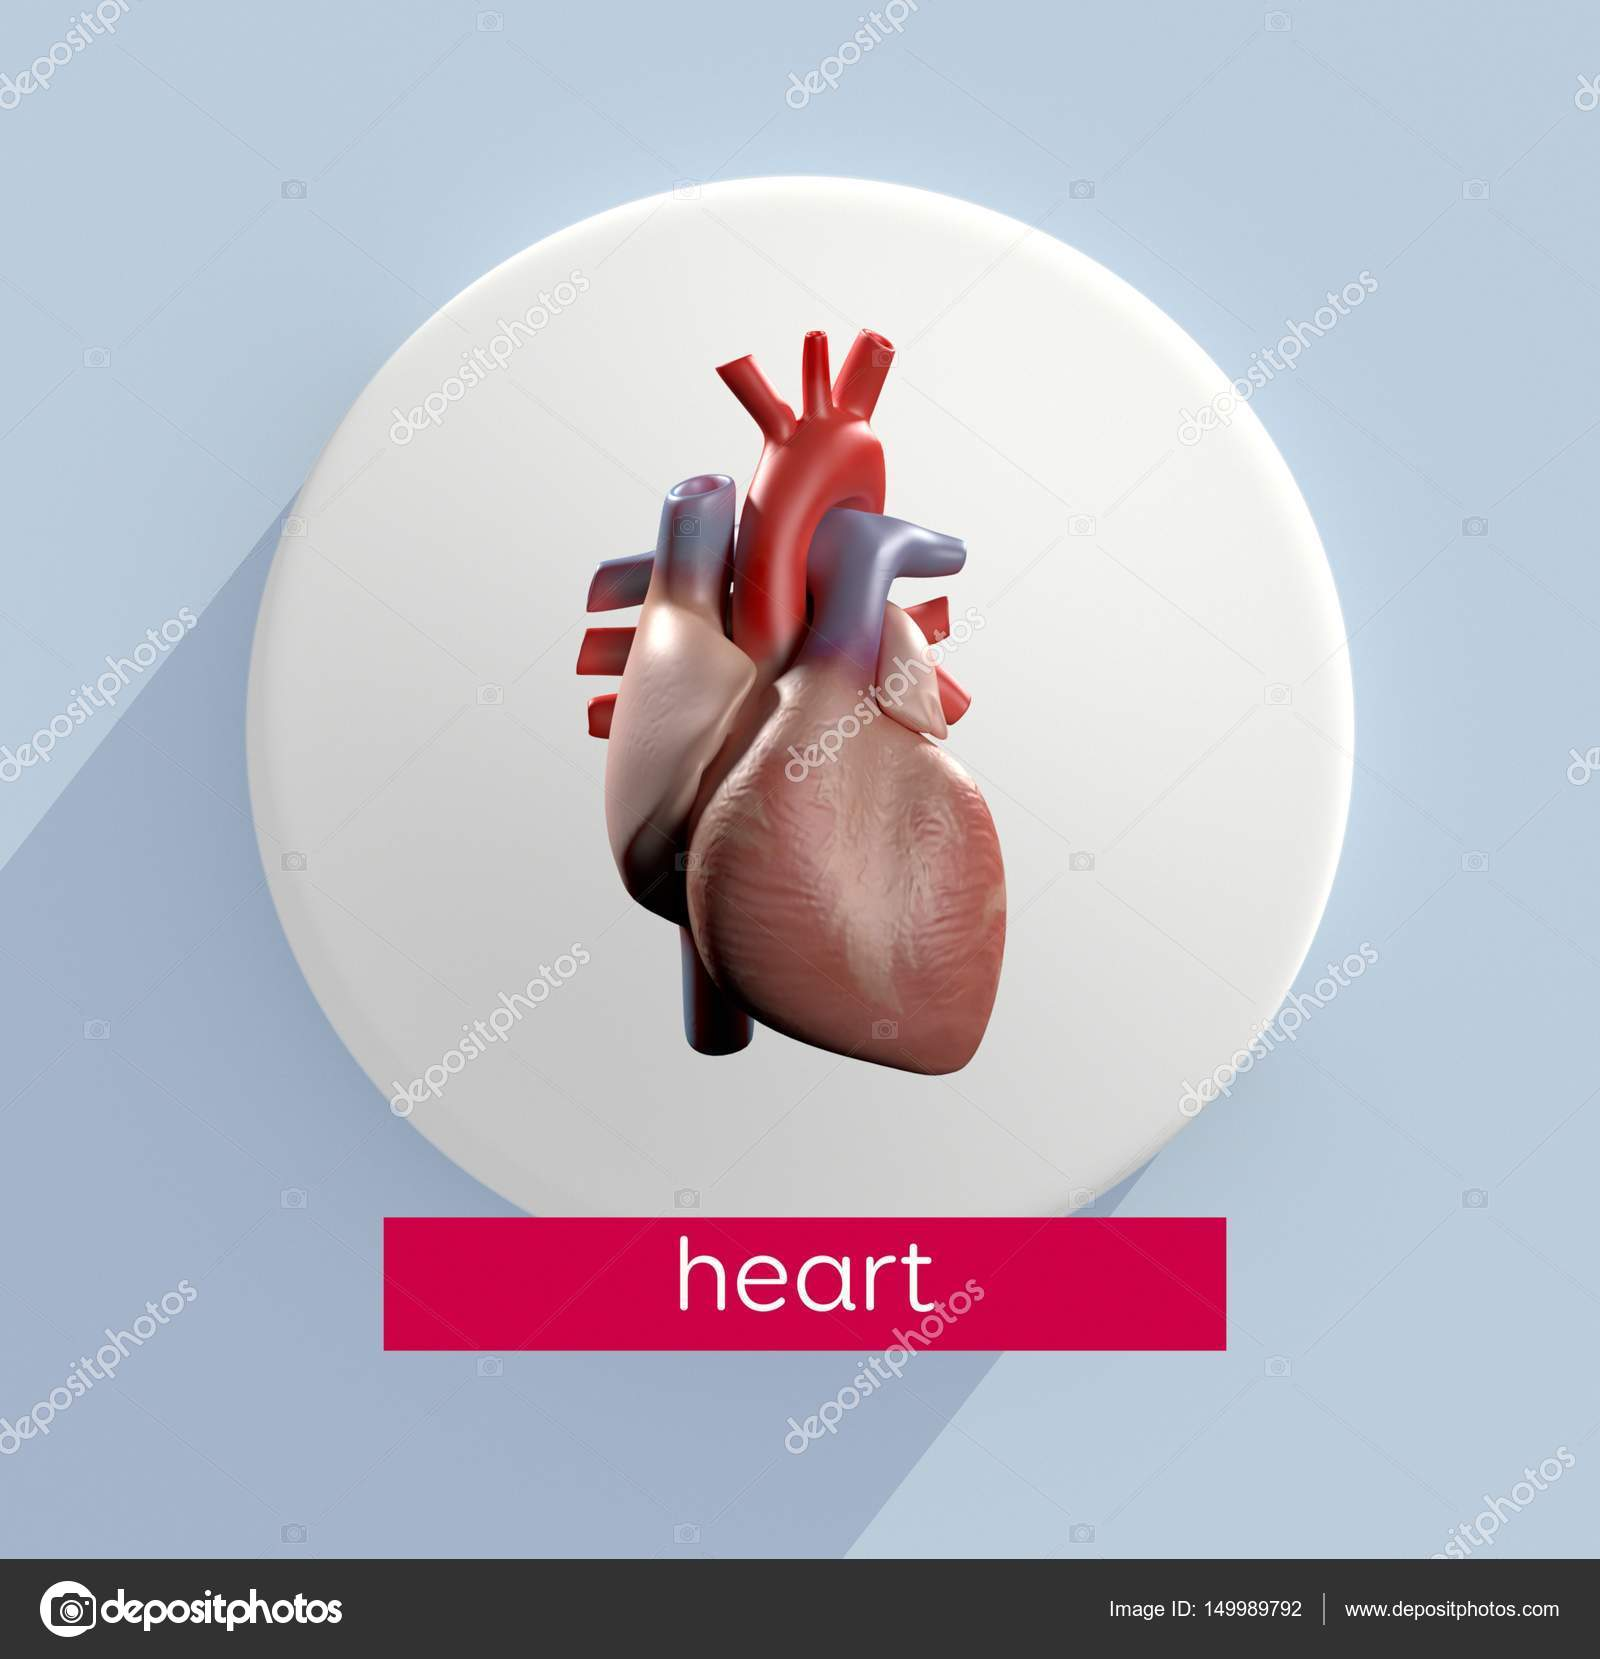 Human Heart Anatomy Model Icon Stock Photo Anatomyinsider 149989792